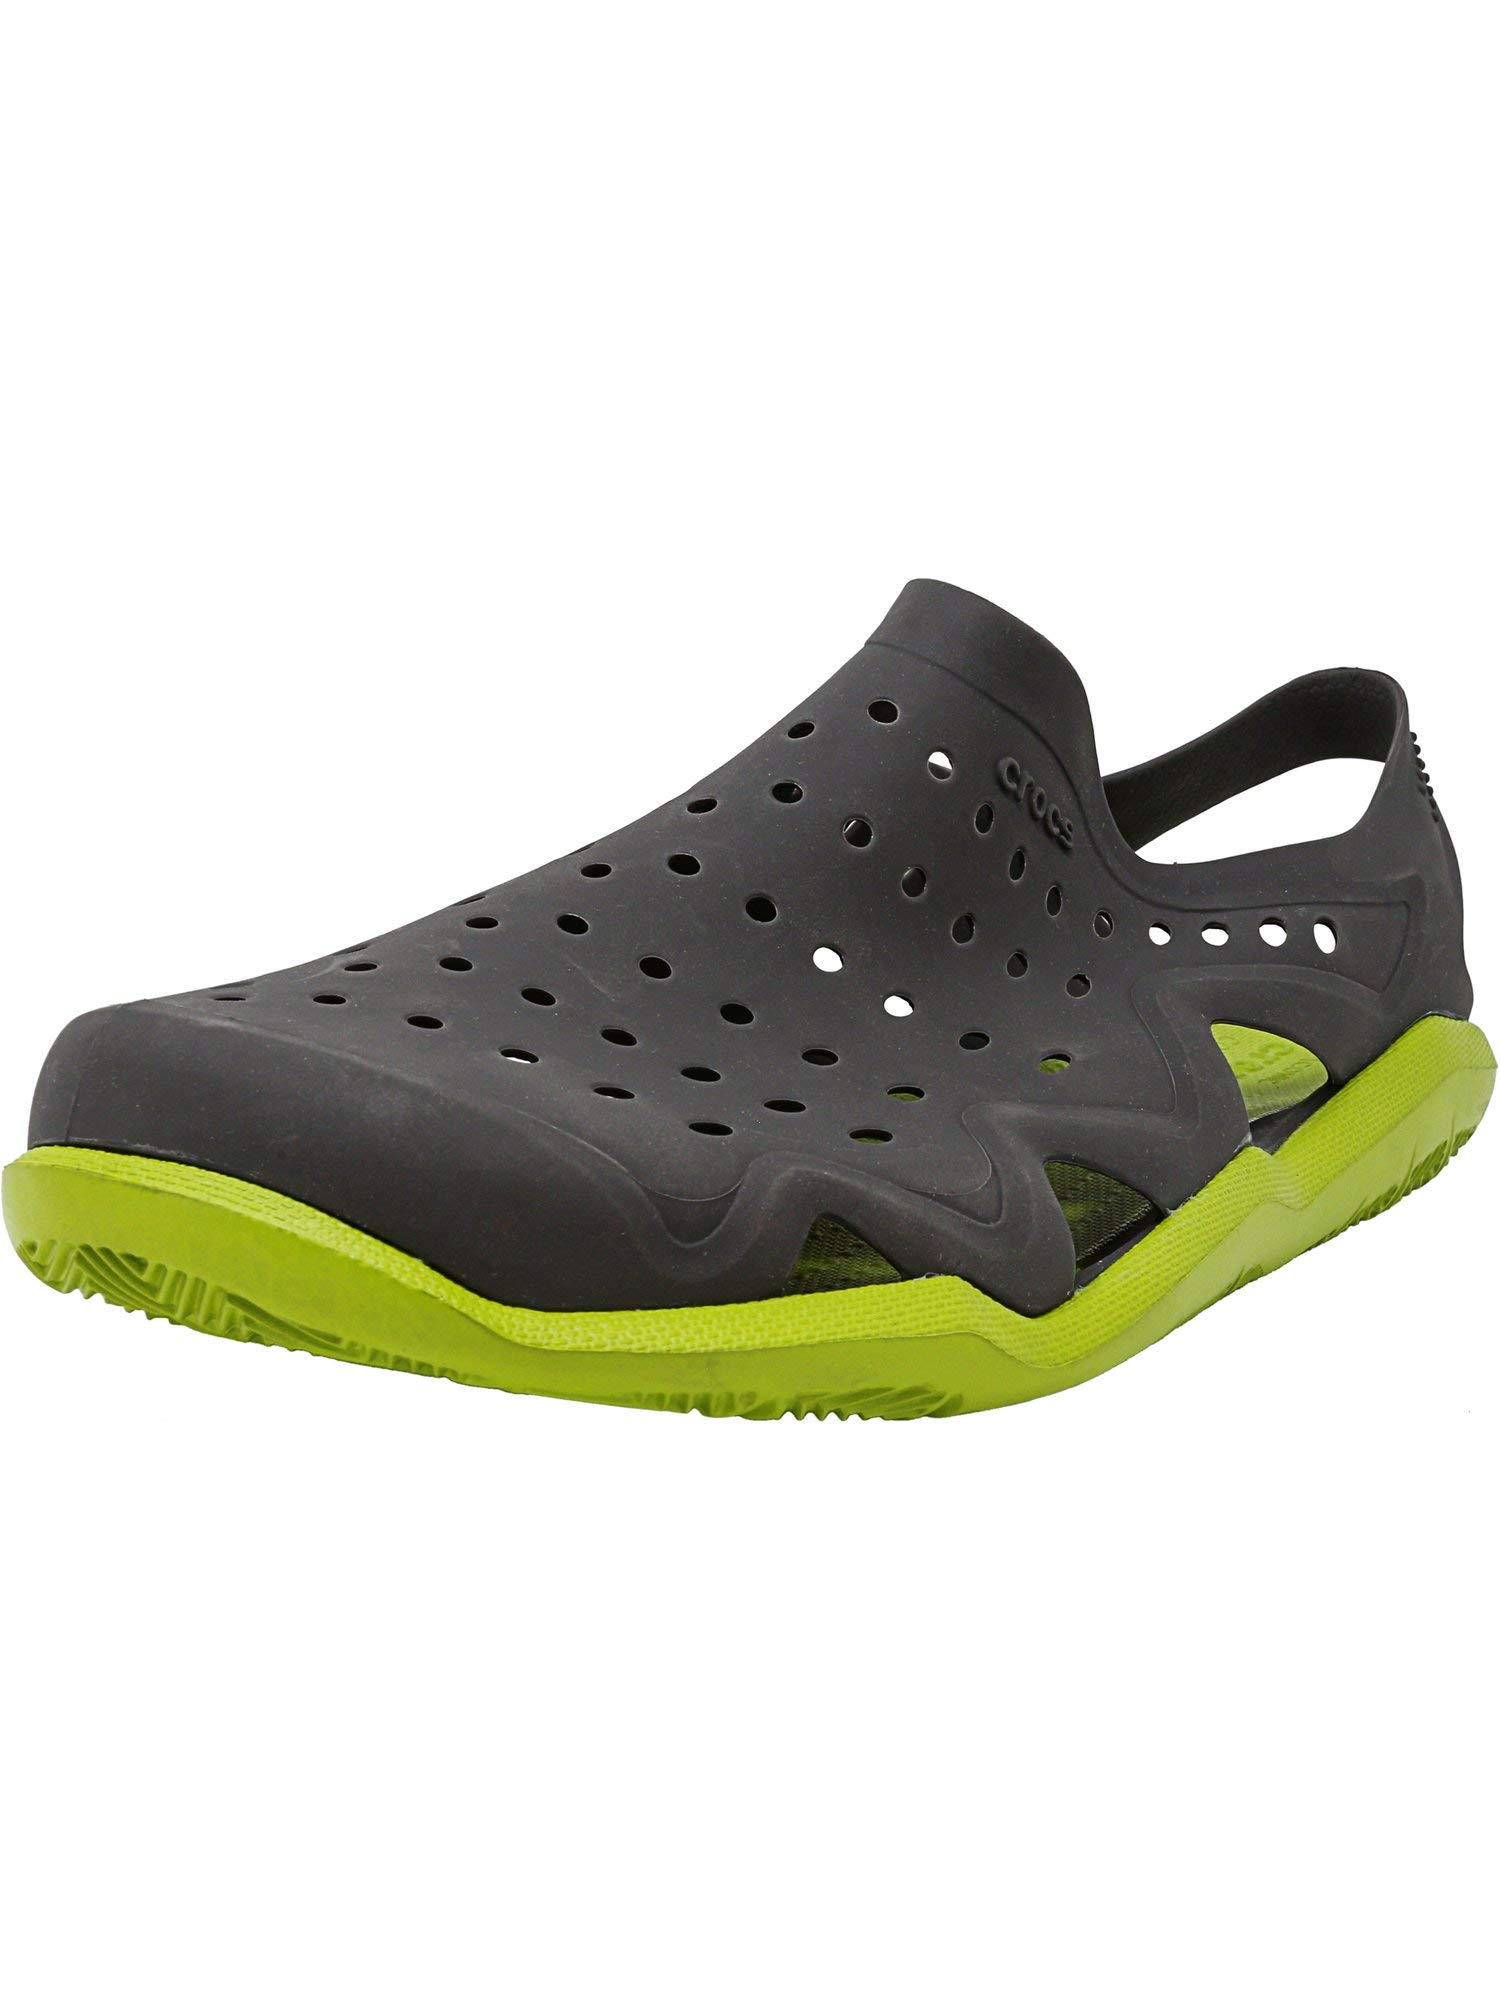 Crocs Men's Swiftwater Wave Graphite/Volt Green Ankle-High Rubber Sandal - 4M by Crocs (Image #1)